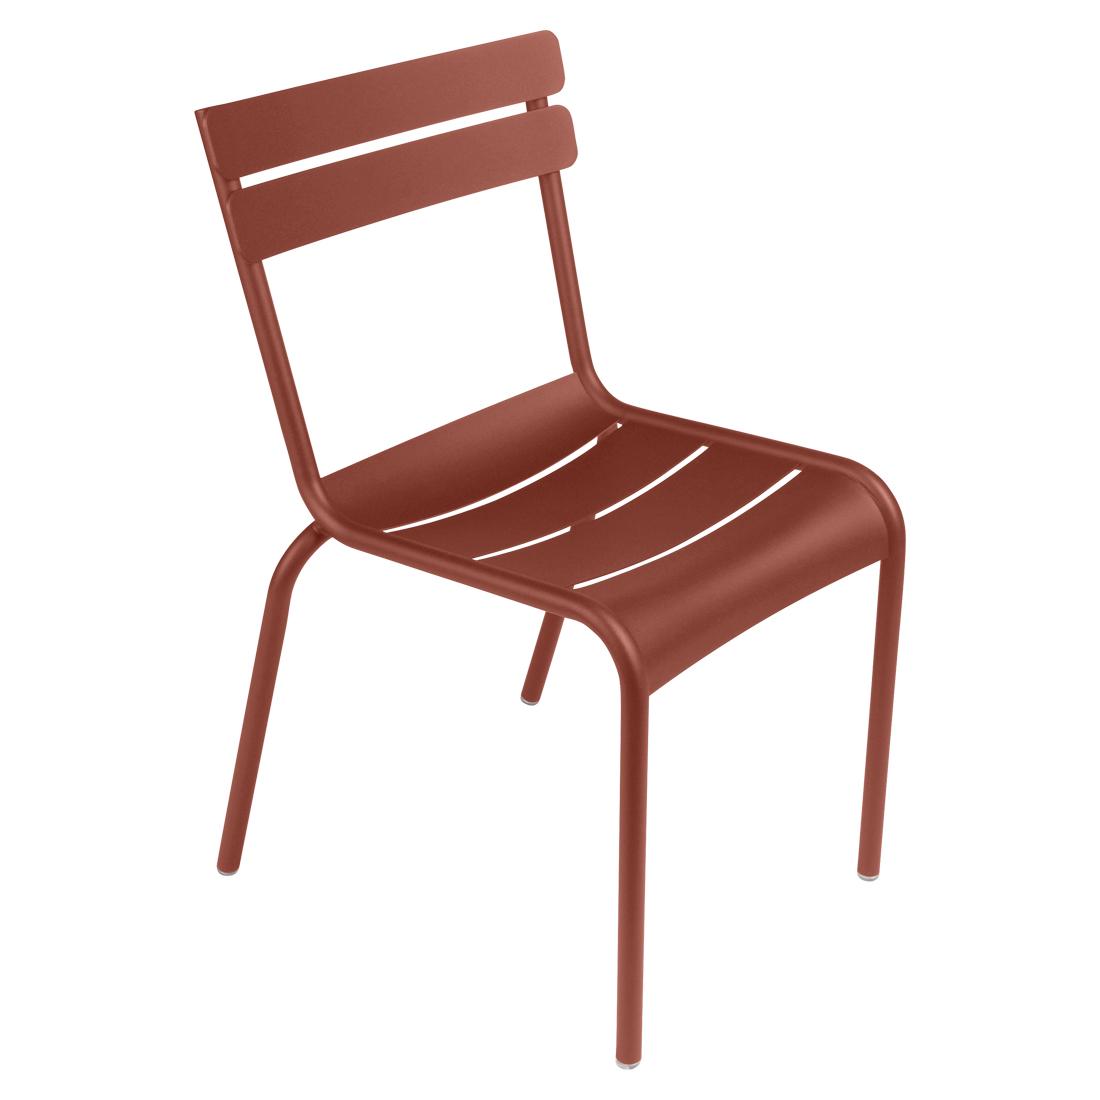 Ockerrot Stuhl Luxembourg ohne Armlehne Fermob